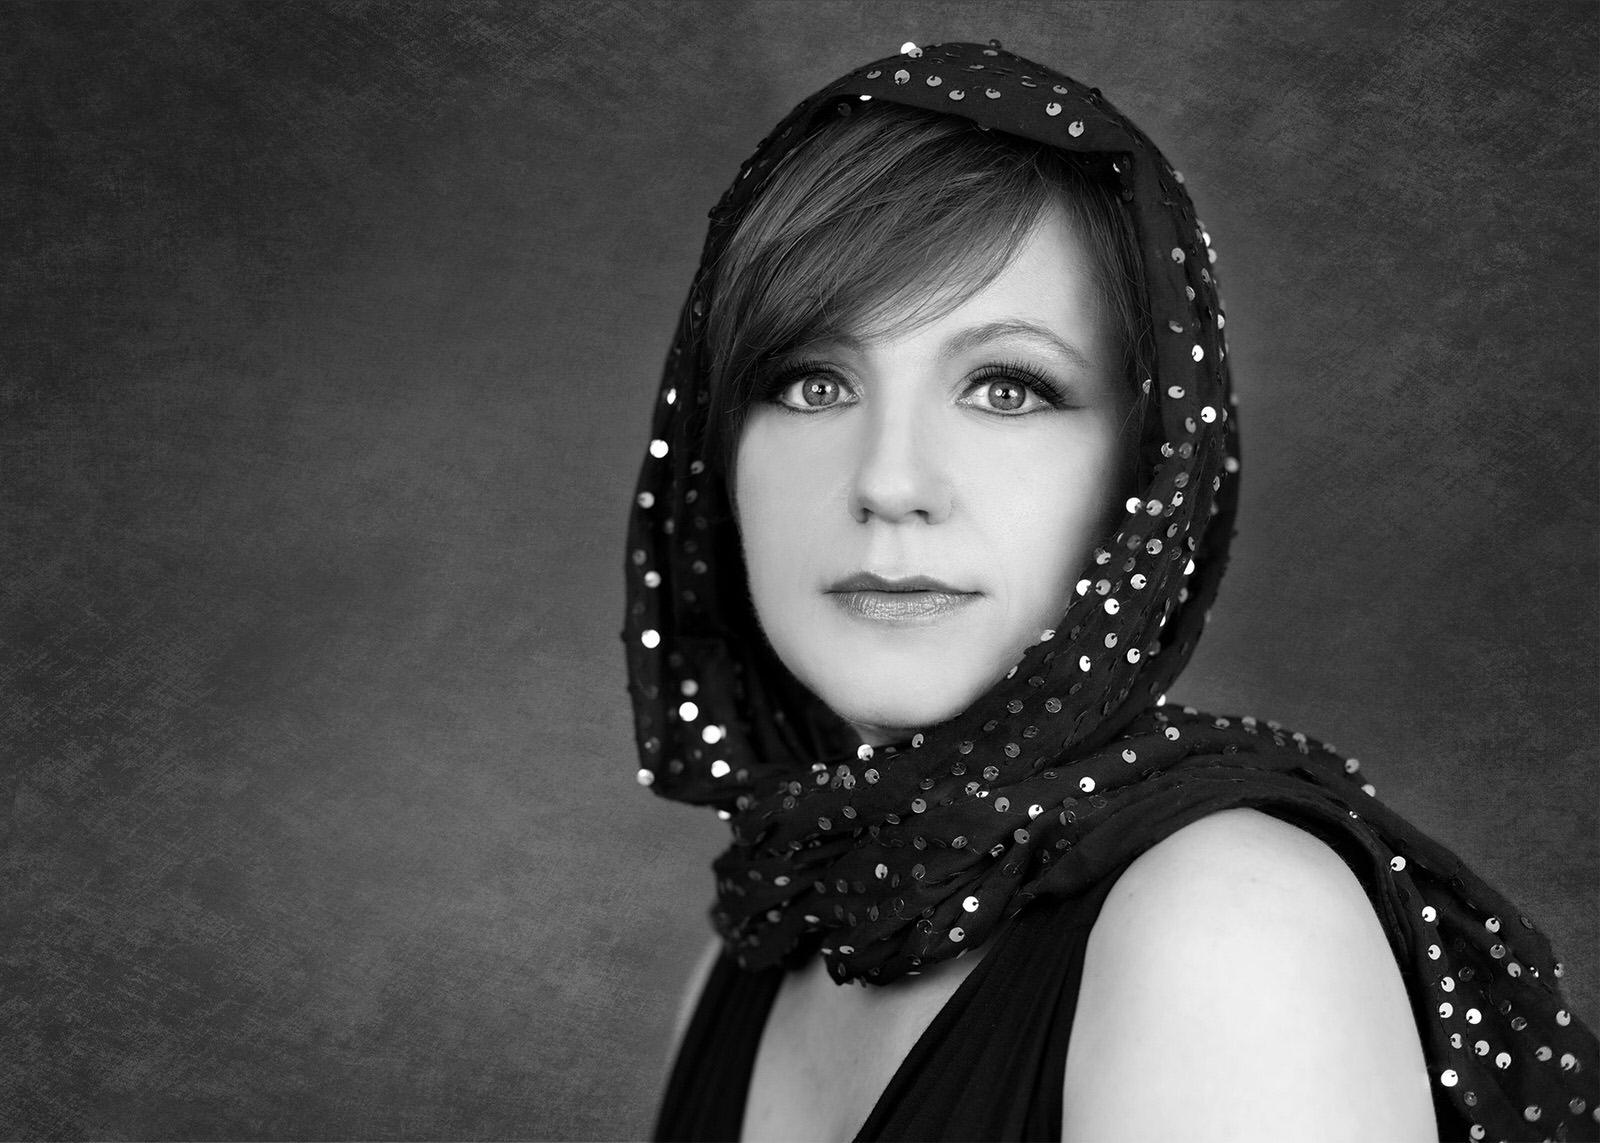 upper-peninsula-photographer-headshot-beautiful-women-contemporary-glamour--marquette-michigan-jackie-solomon-photography-035.jpg